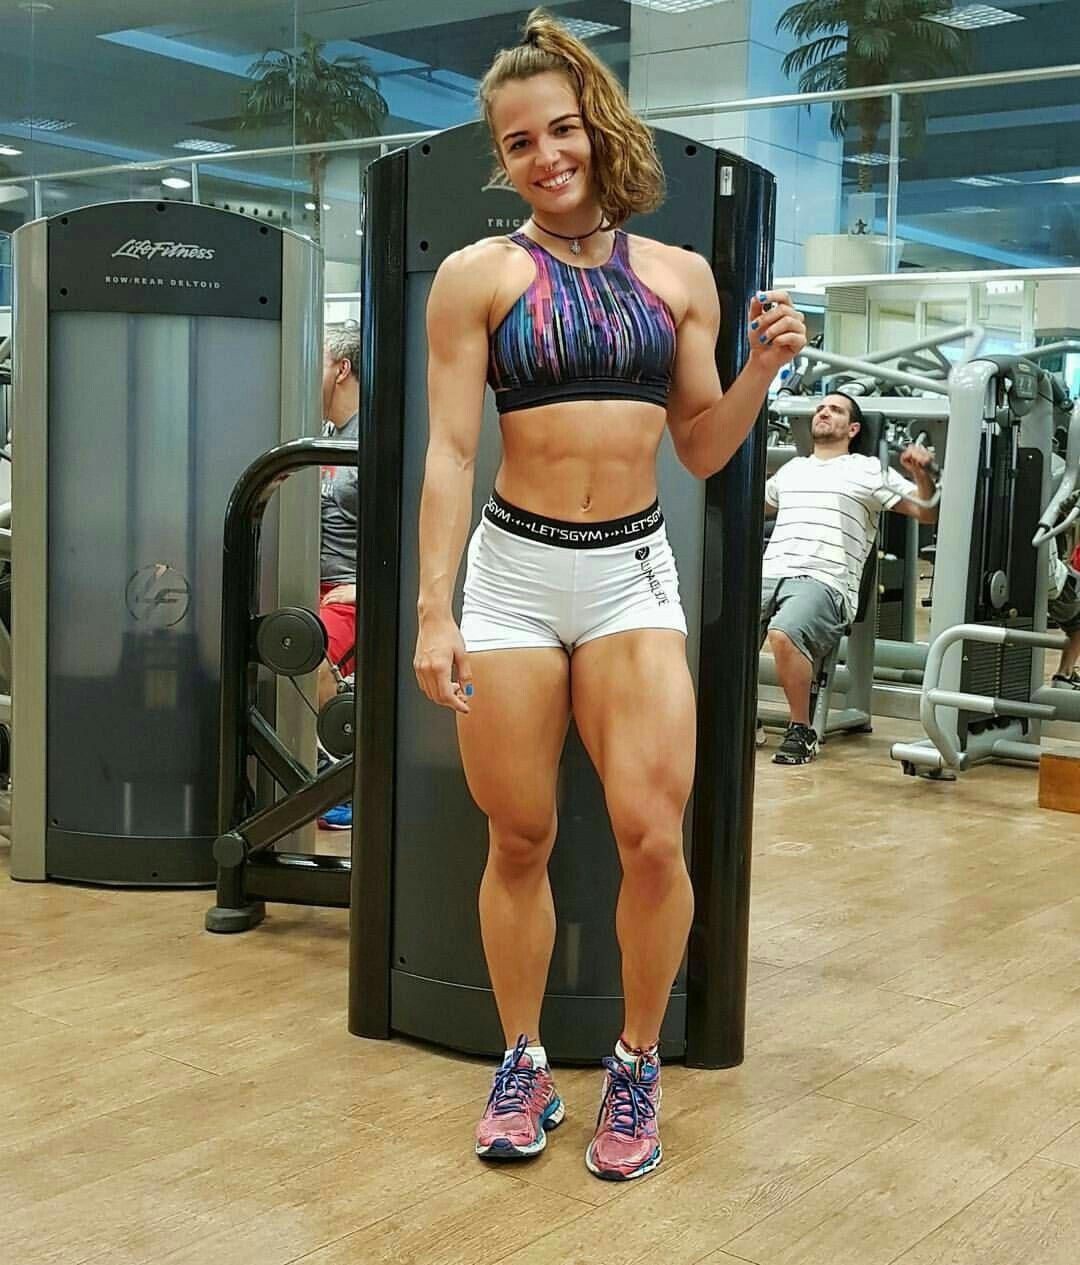 Gym Girl Vanessa Garcia  Health  Fitness 57  Pinterest -1538